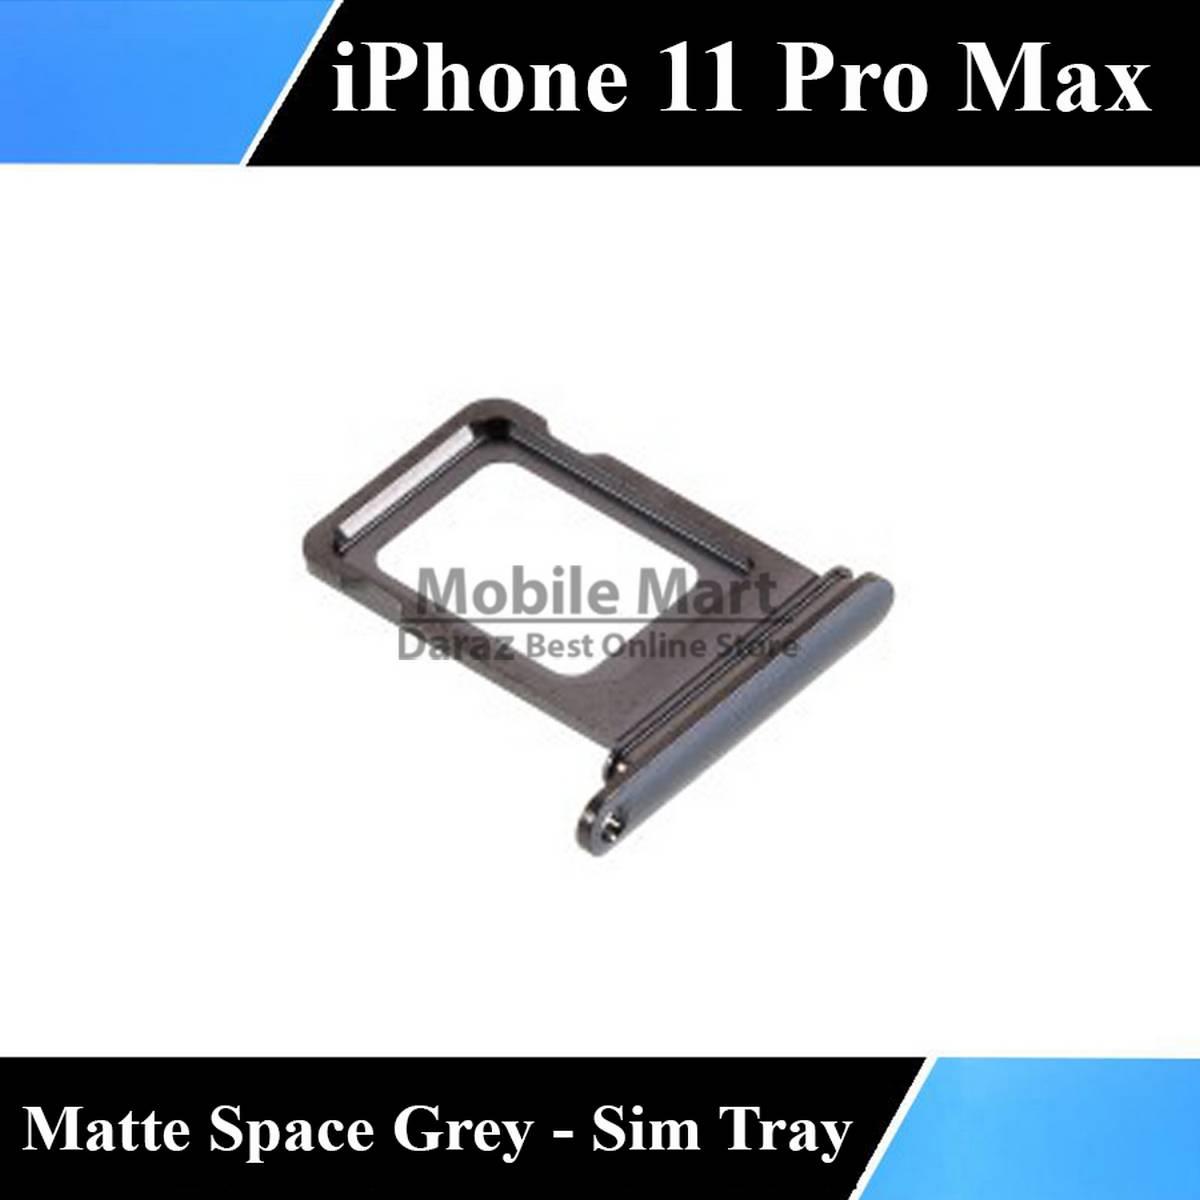 iPhone 11 Pro Max SIM Tray Sim Jacket Sim Slot Sim Door For 11 Pro Max - Matte Space Grey